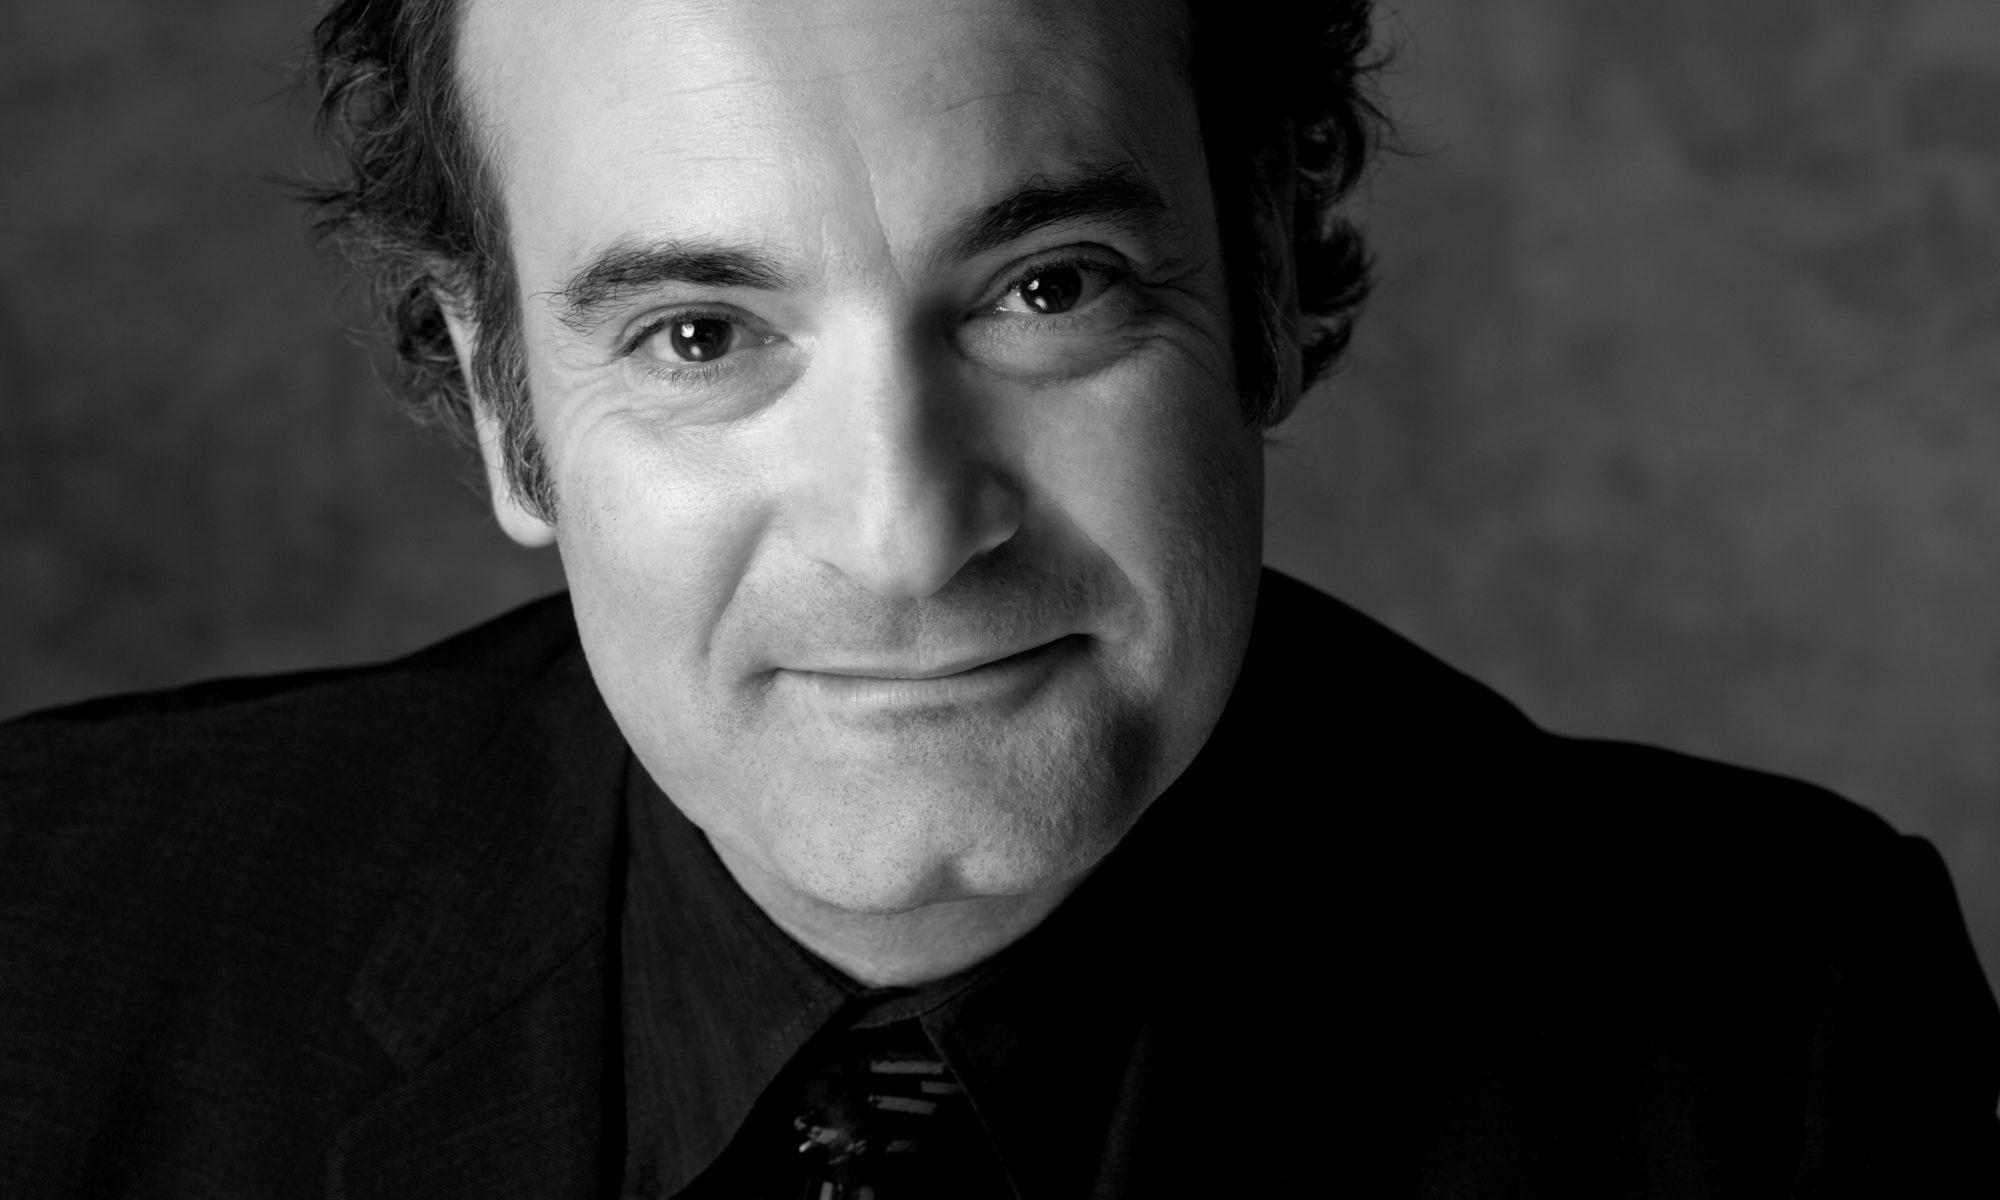 Ricardo Accorsi, by John Livzey